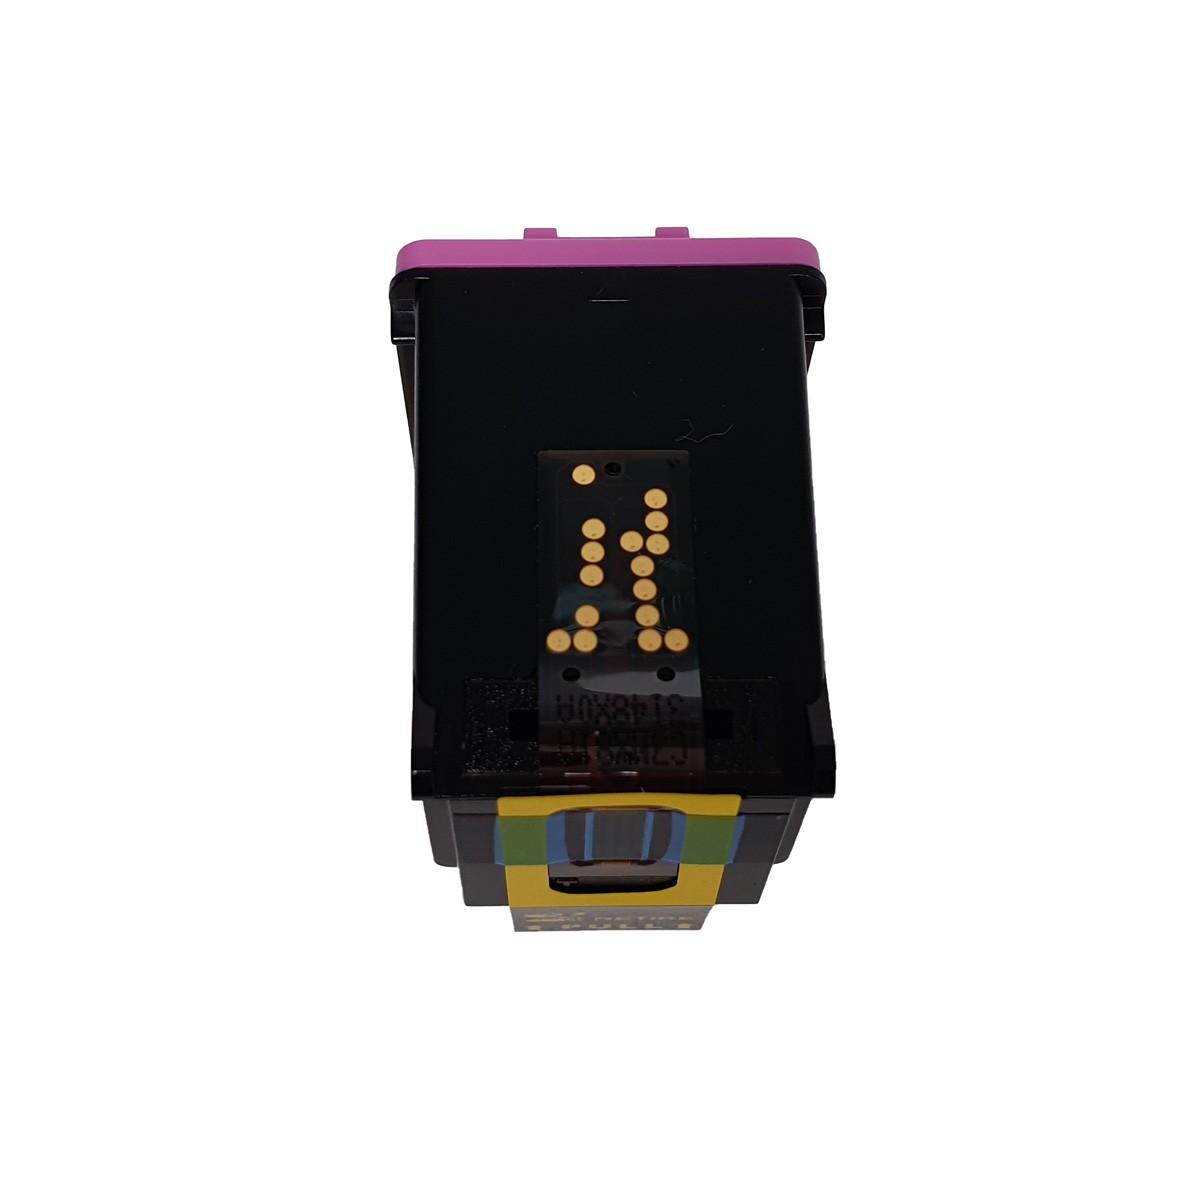 Cartucho MJ Compatível 122XL Colorido 12ml para D1000 D2050 D3050 2050 da HP